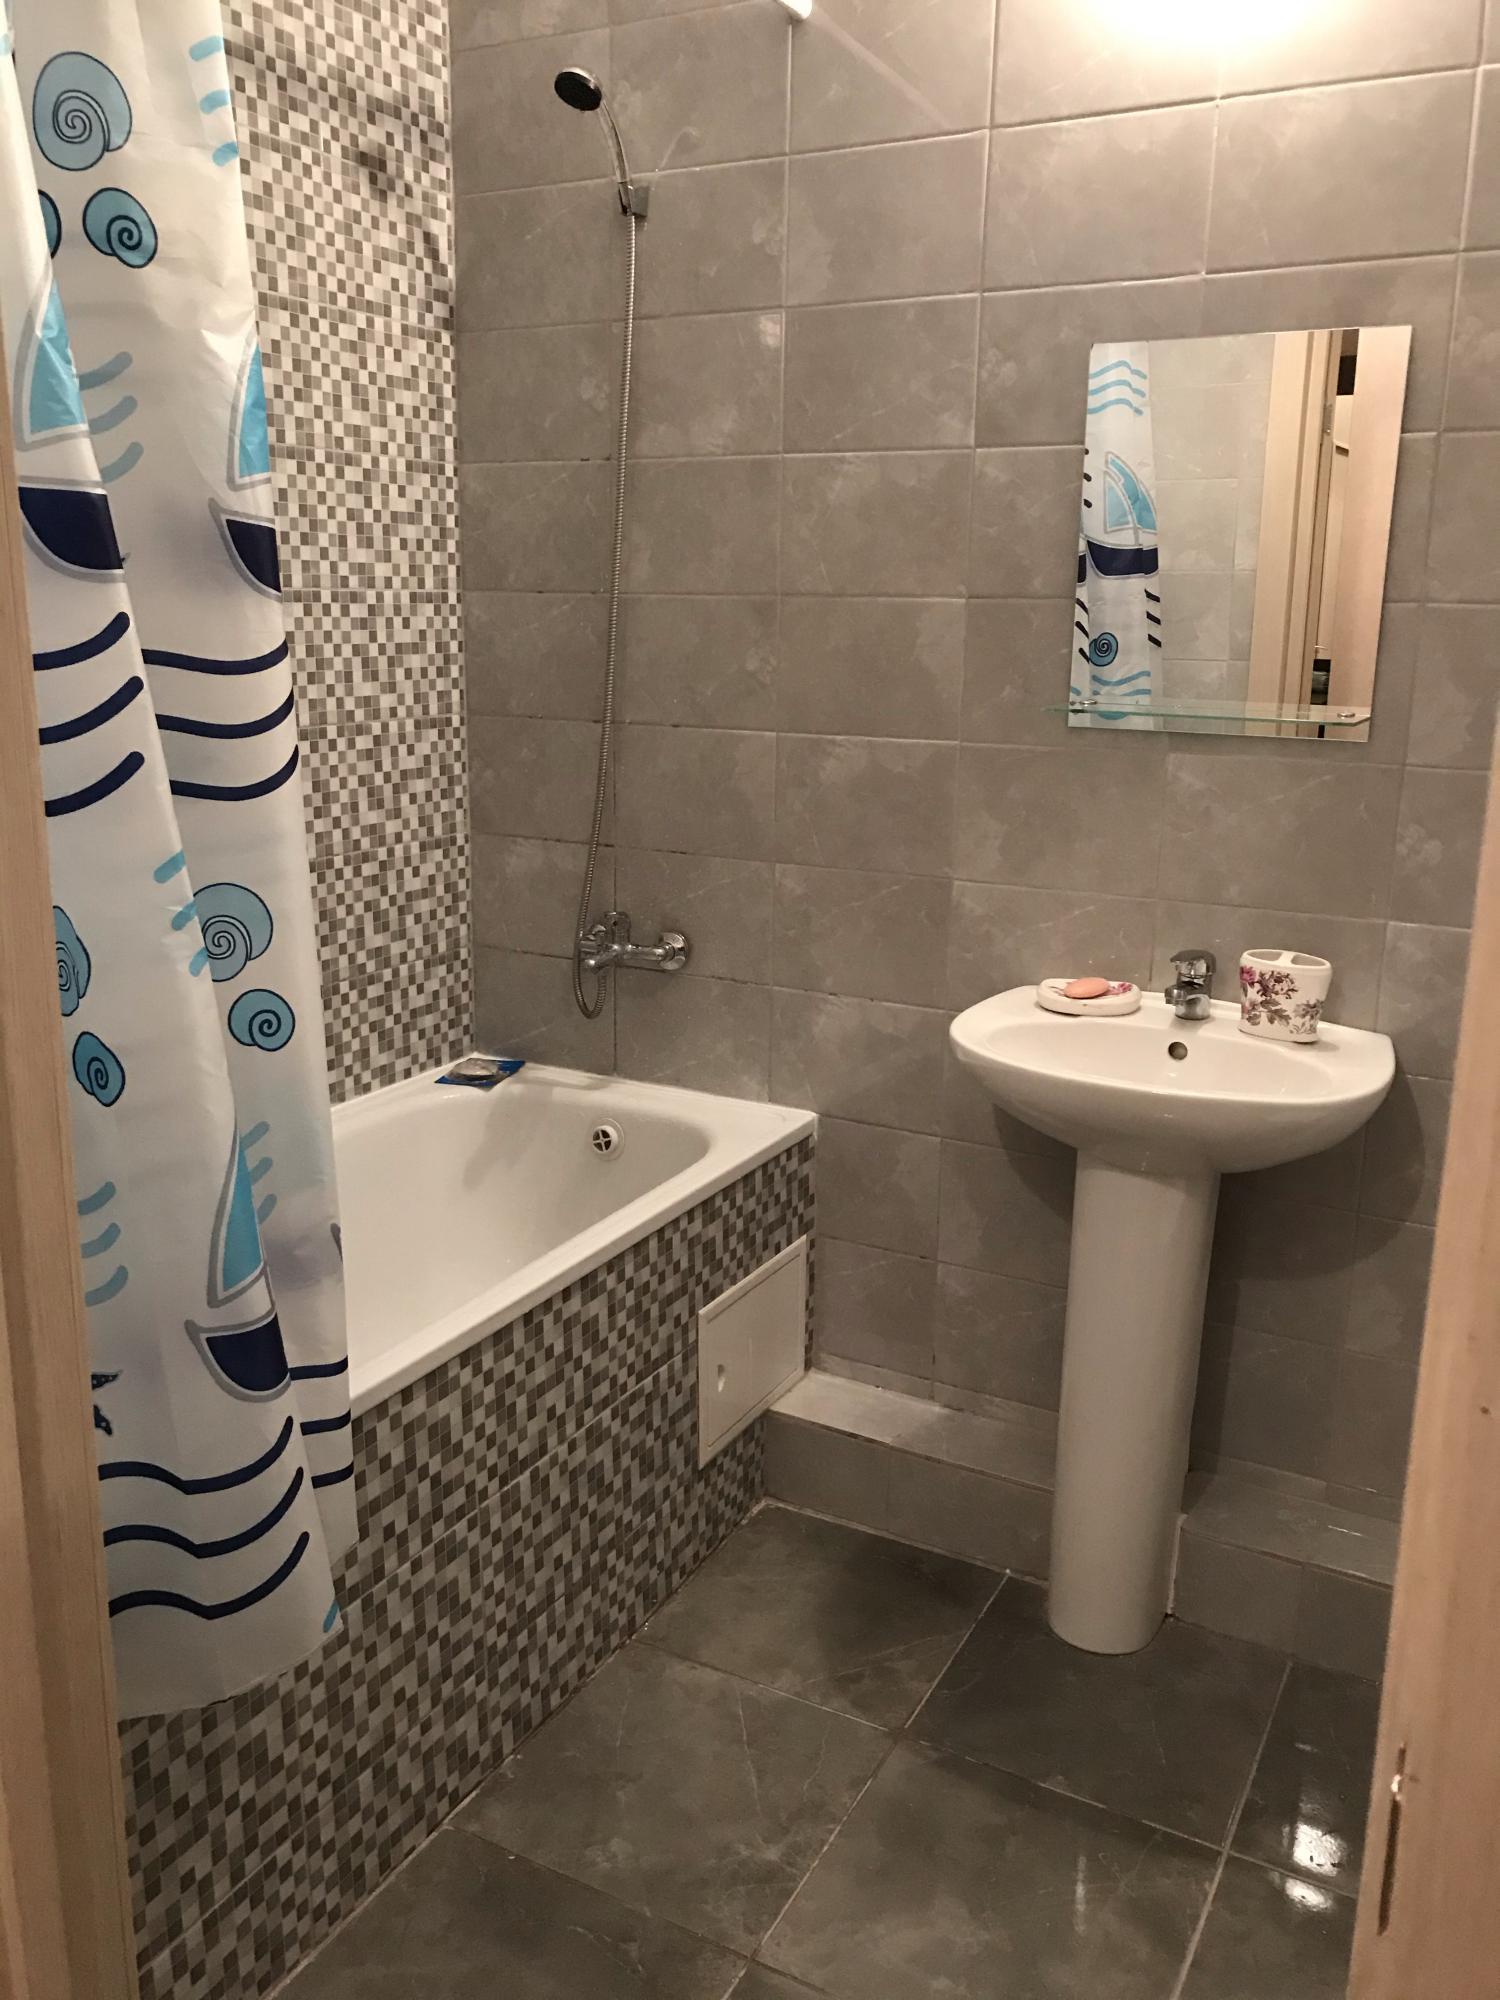 Квартира, 1 комната, 35 м² 89258601492 купить 8